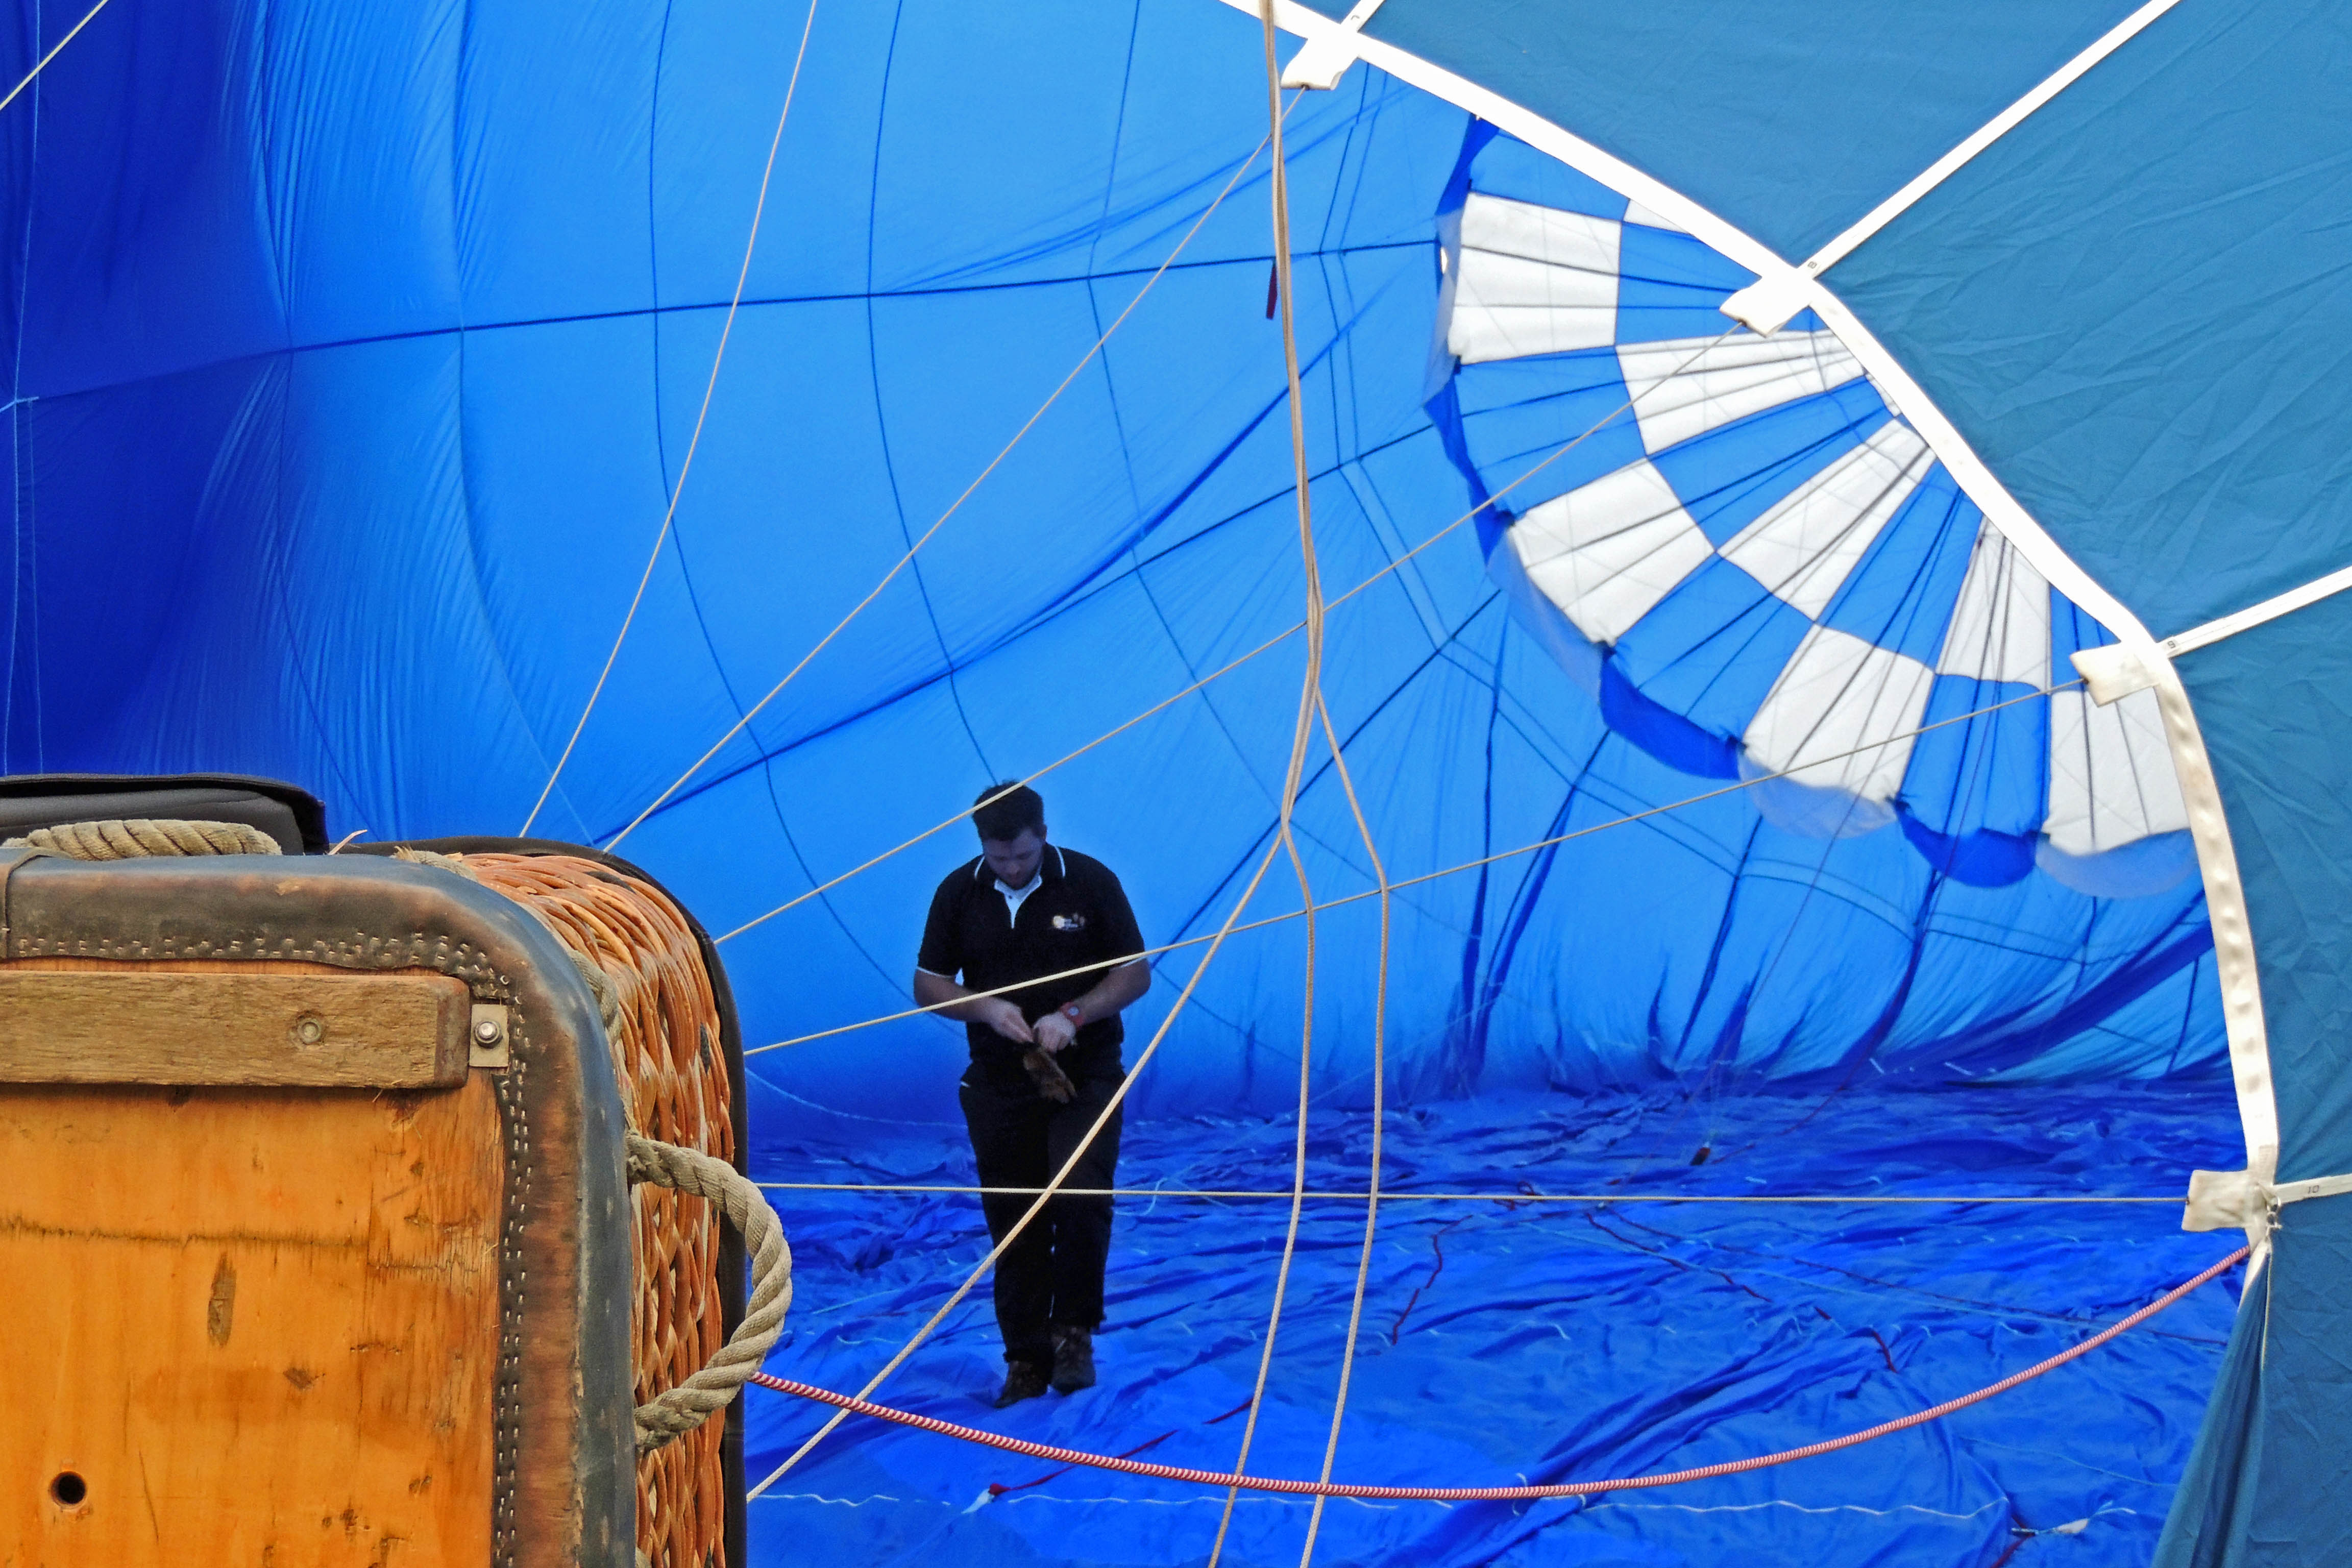 A Canberra Balloon Trip